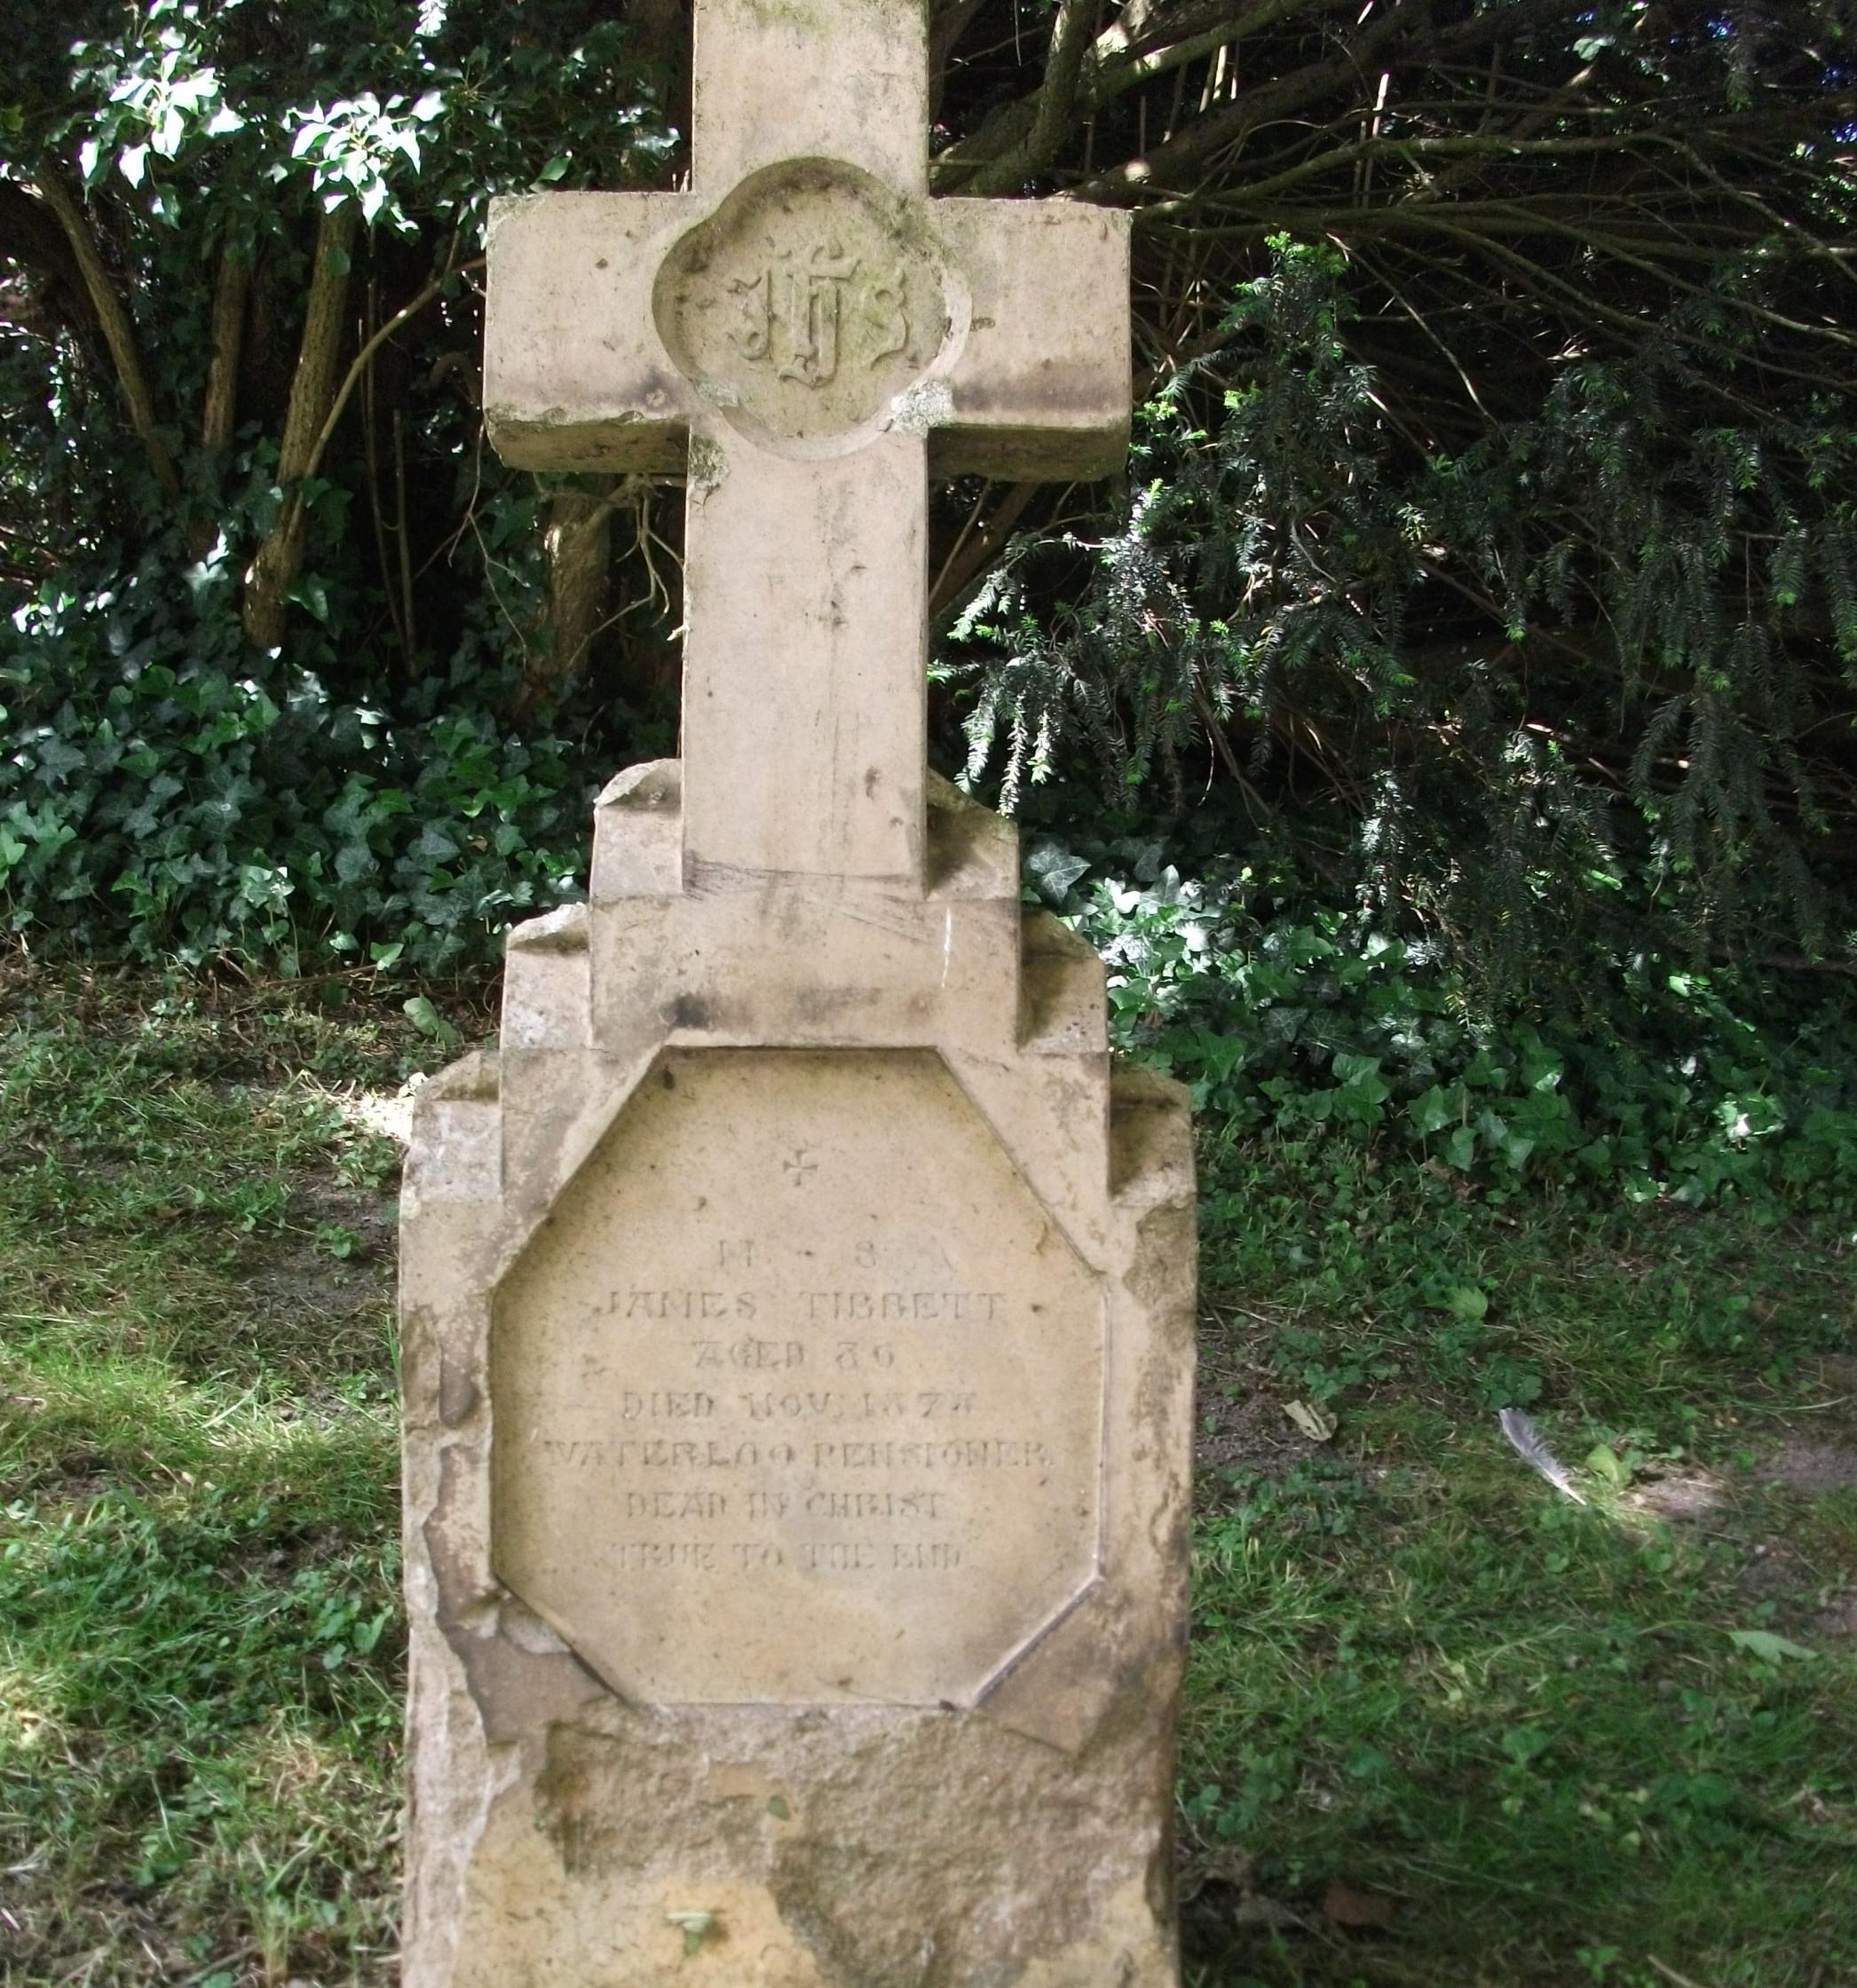 The grave stone